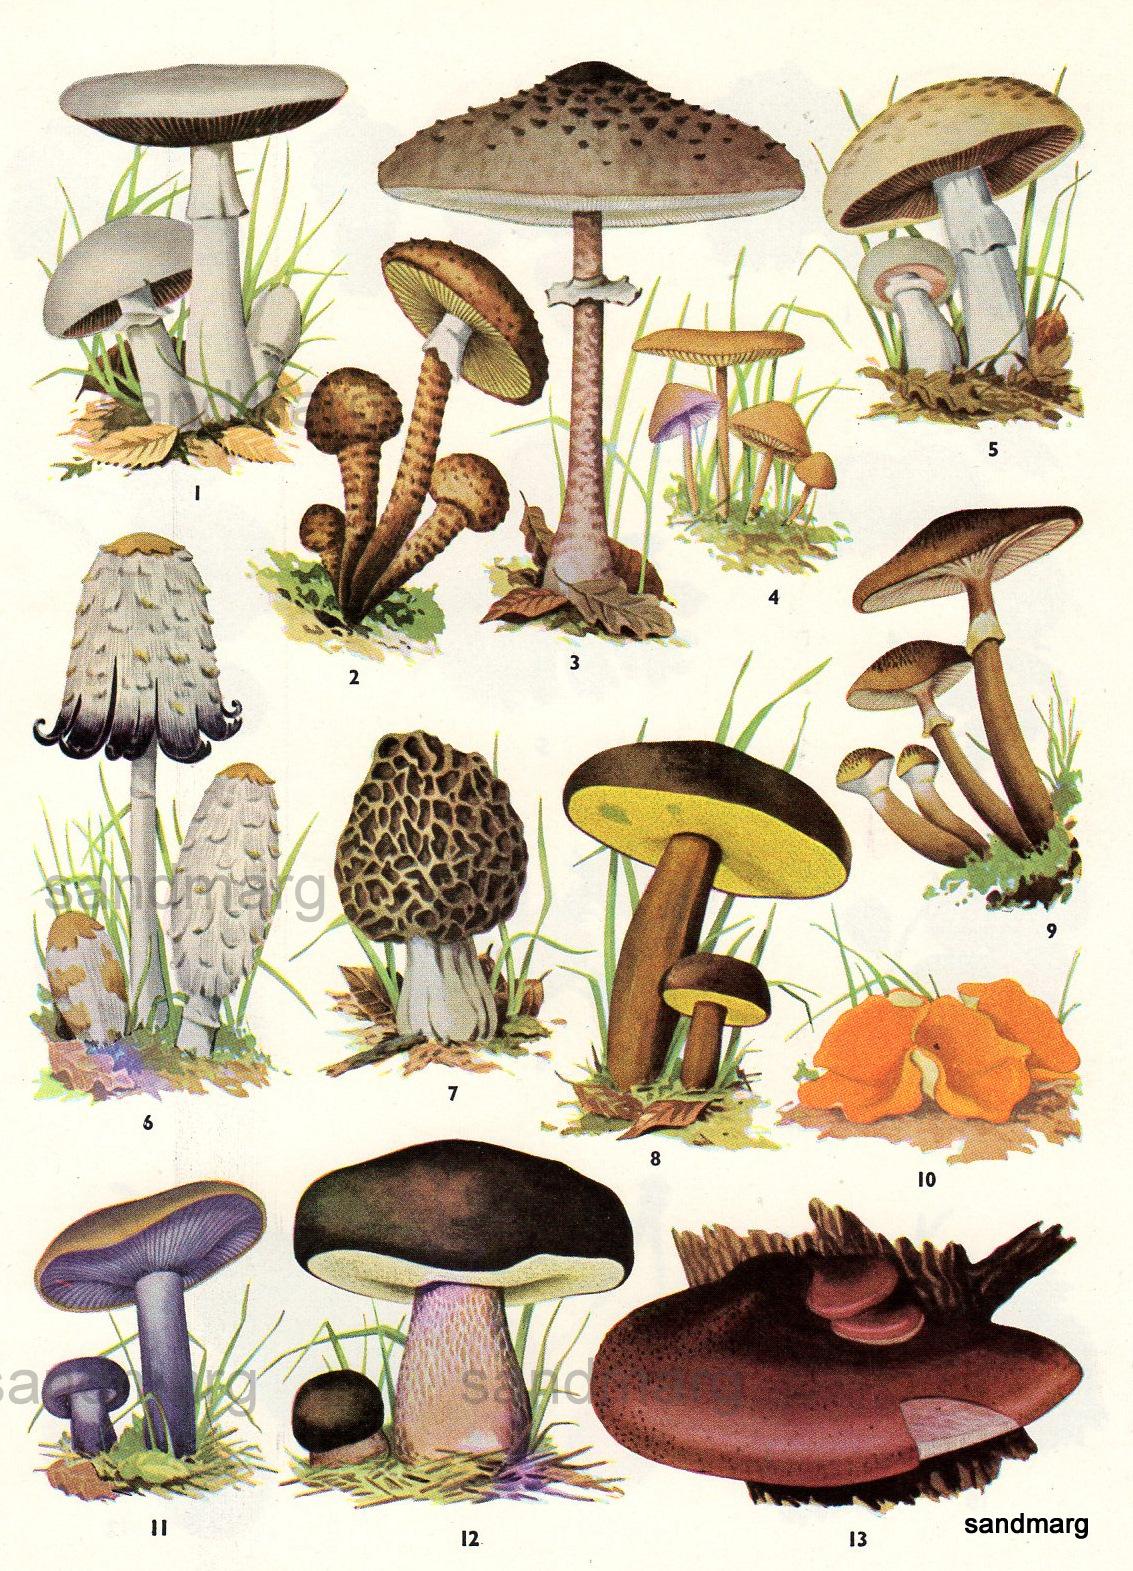 sandmarg: Chart of Edible Mushrooms